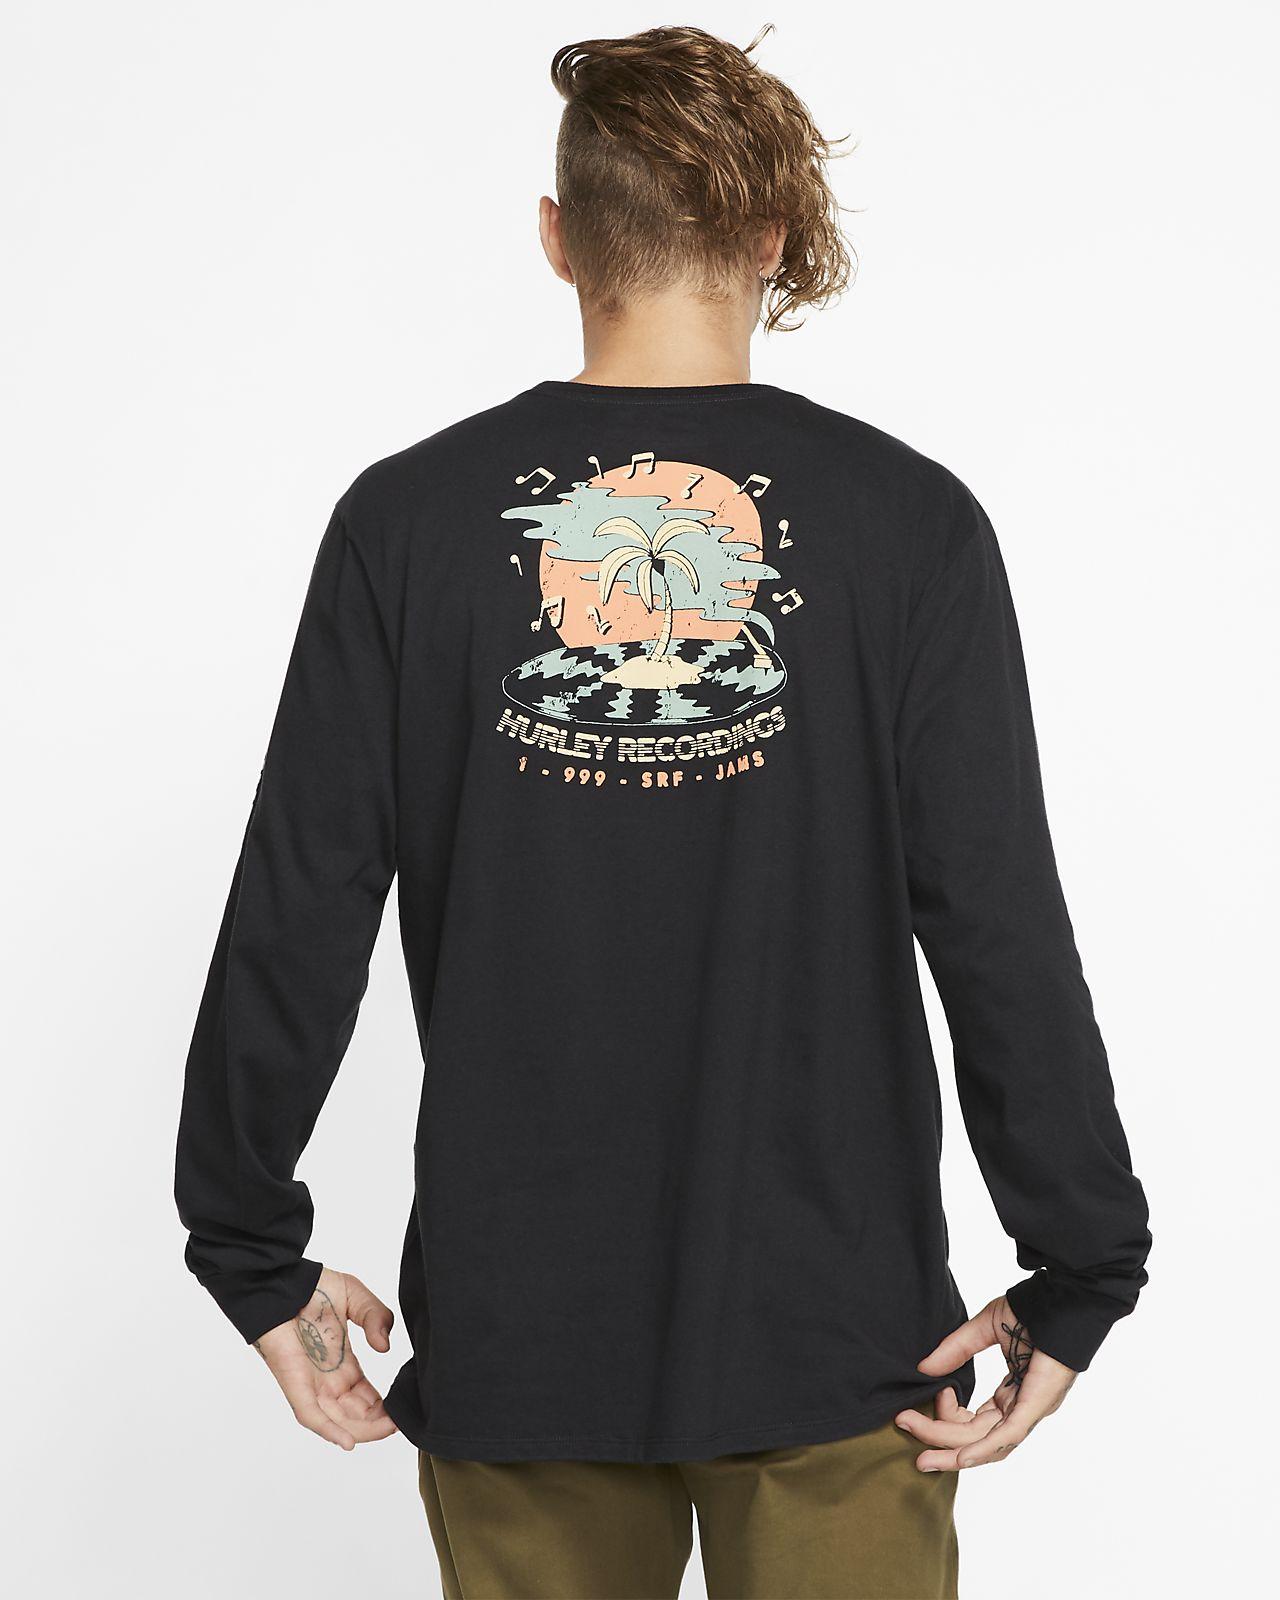 T-shirt a manica lunga Hurley Premium Record Palms - Uomo